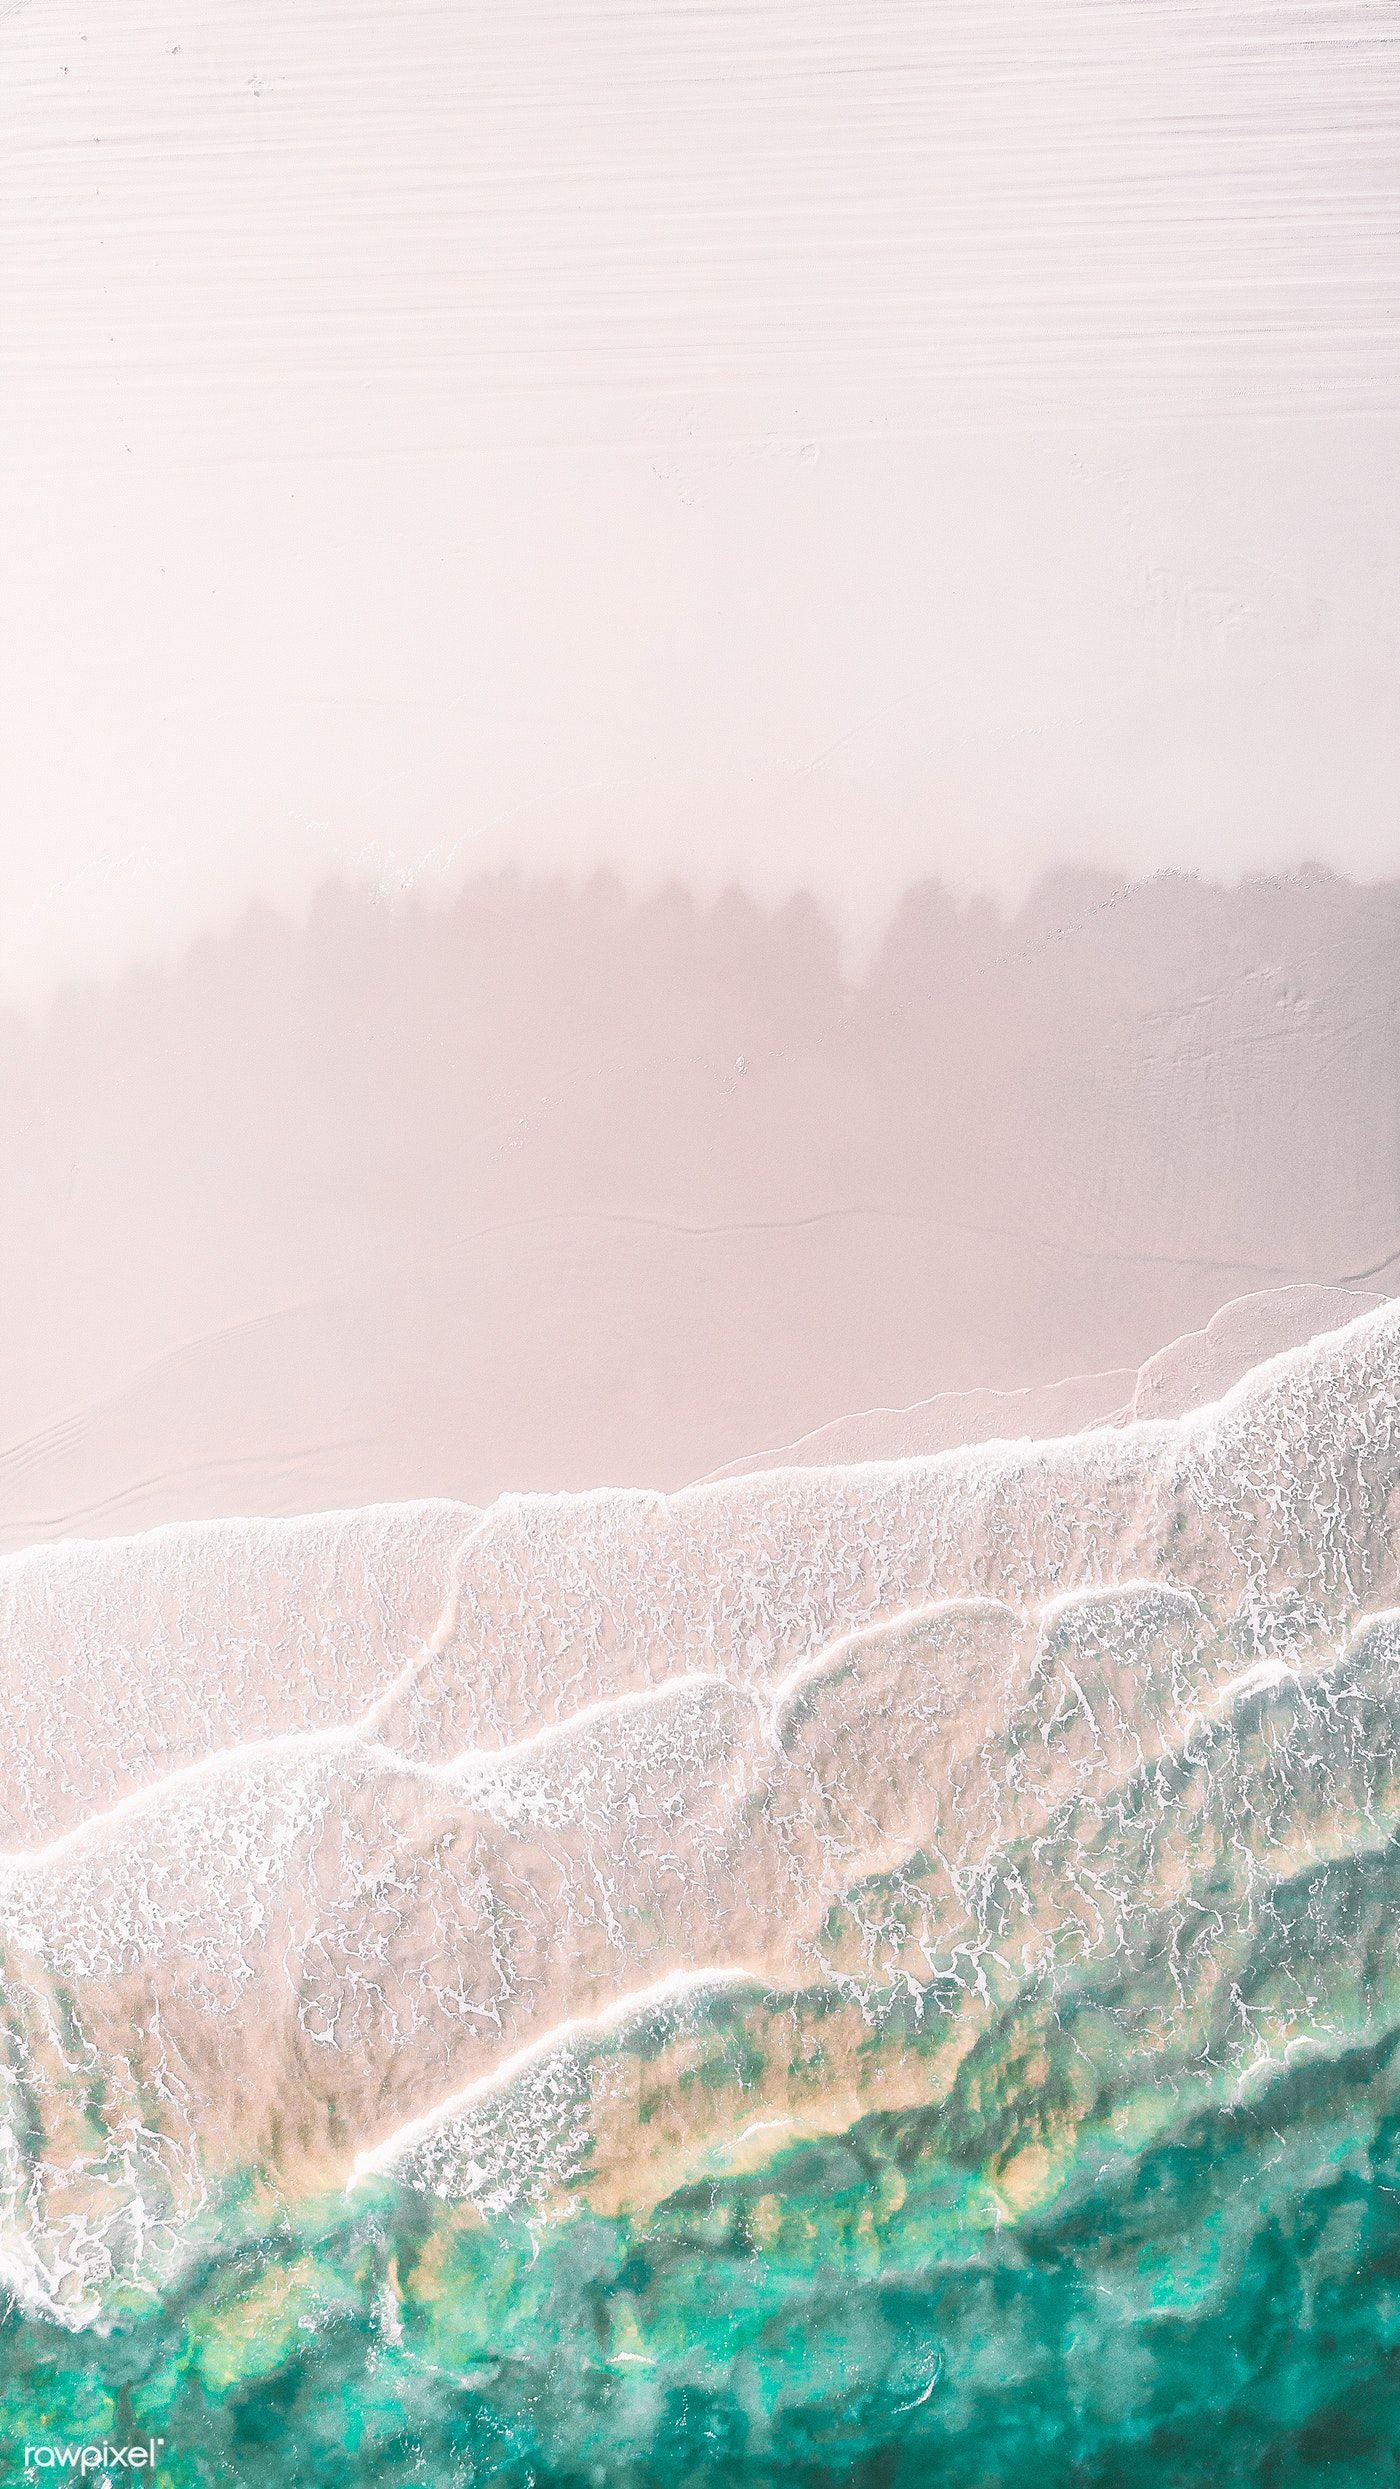 Download Premium Image Of White Sand Beach Mobile Phone Wallpaper Drone Beach Wallpaper Beach Wallpaper Iphone Ocean Wallpaper